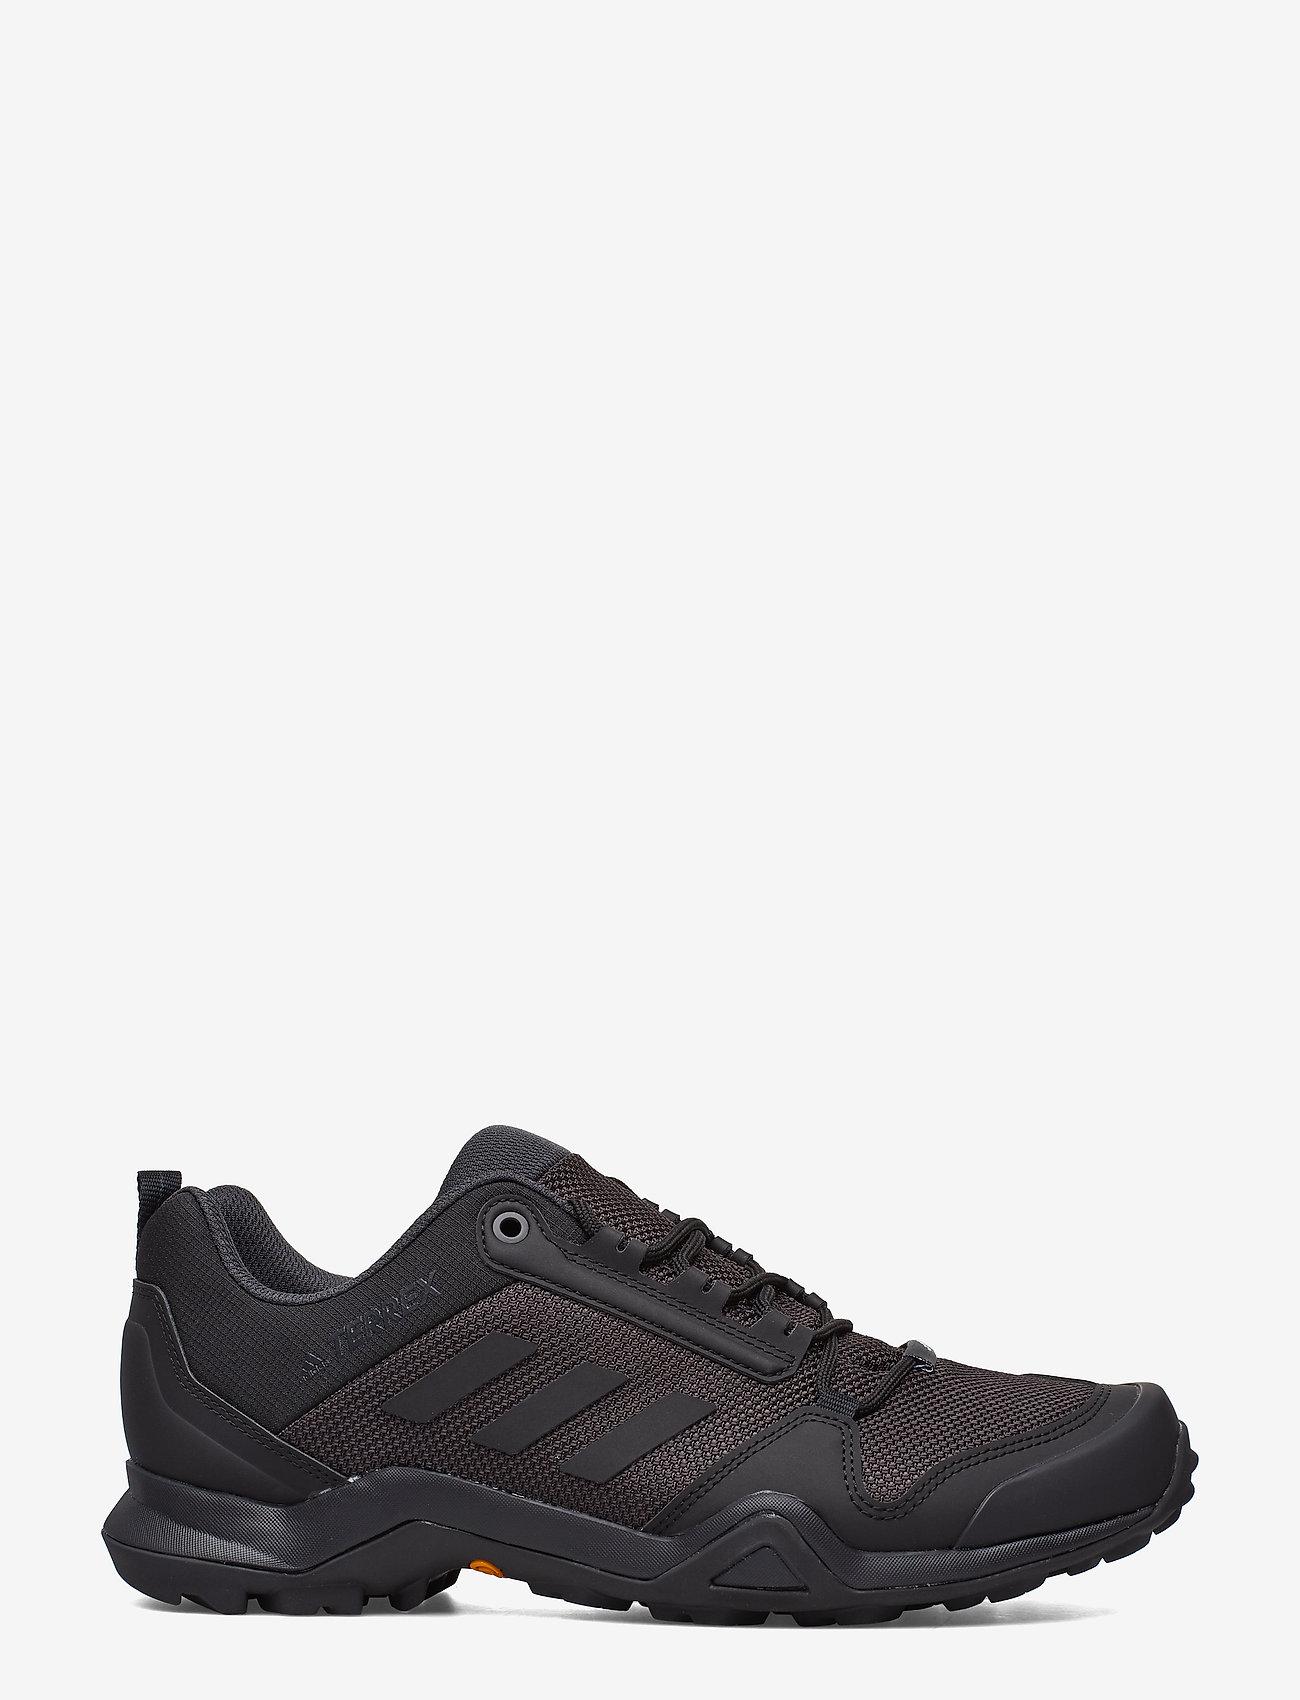 adidas Performance - TERREX AX3 - löbesko - cblack/cblack/carbon - 1